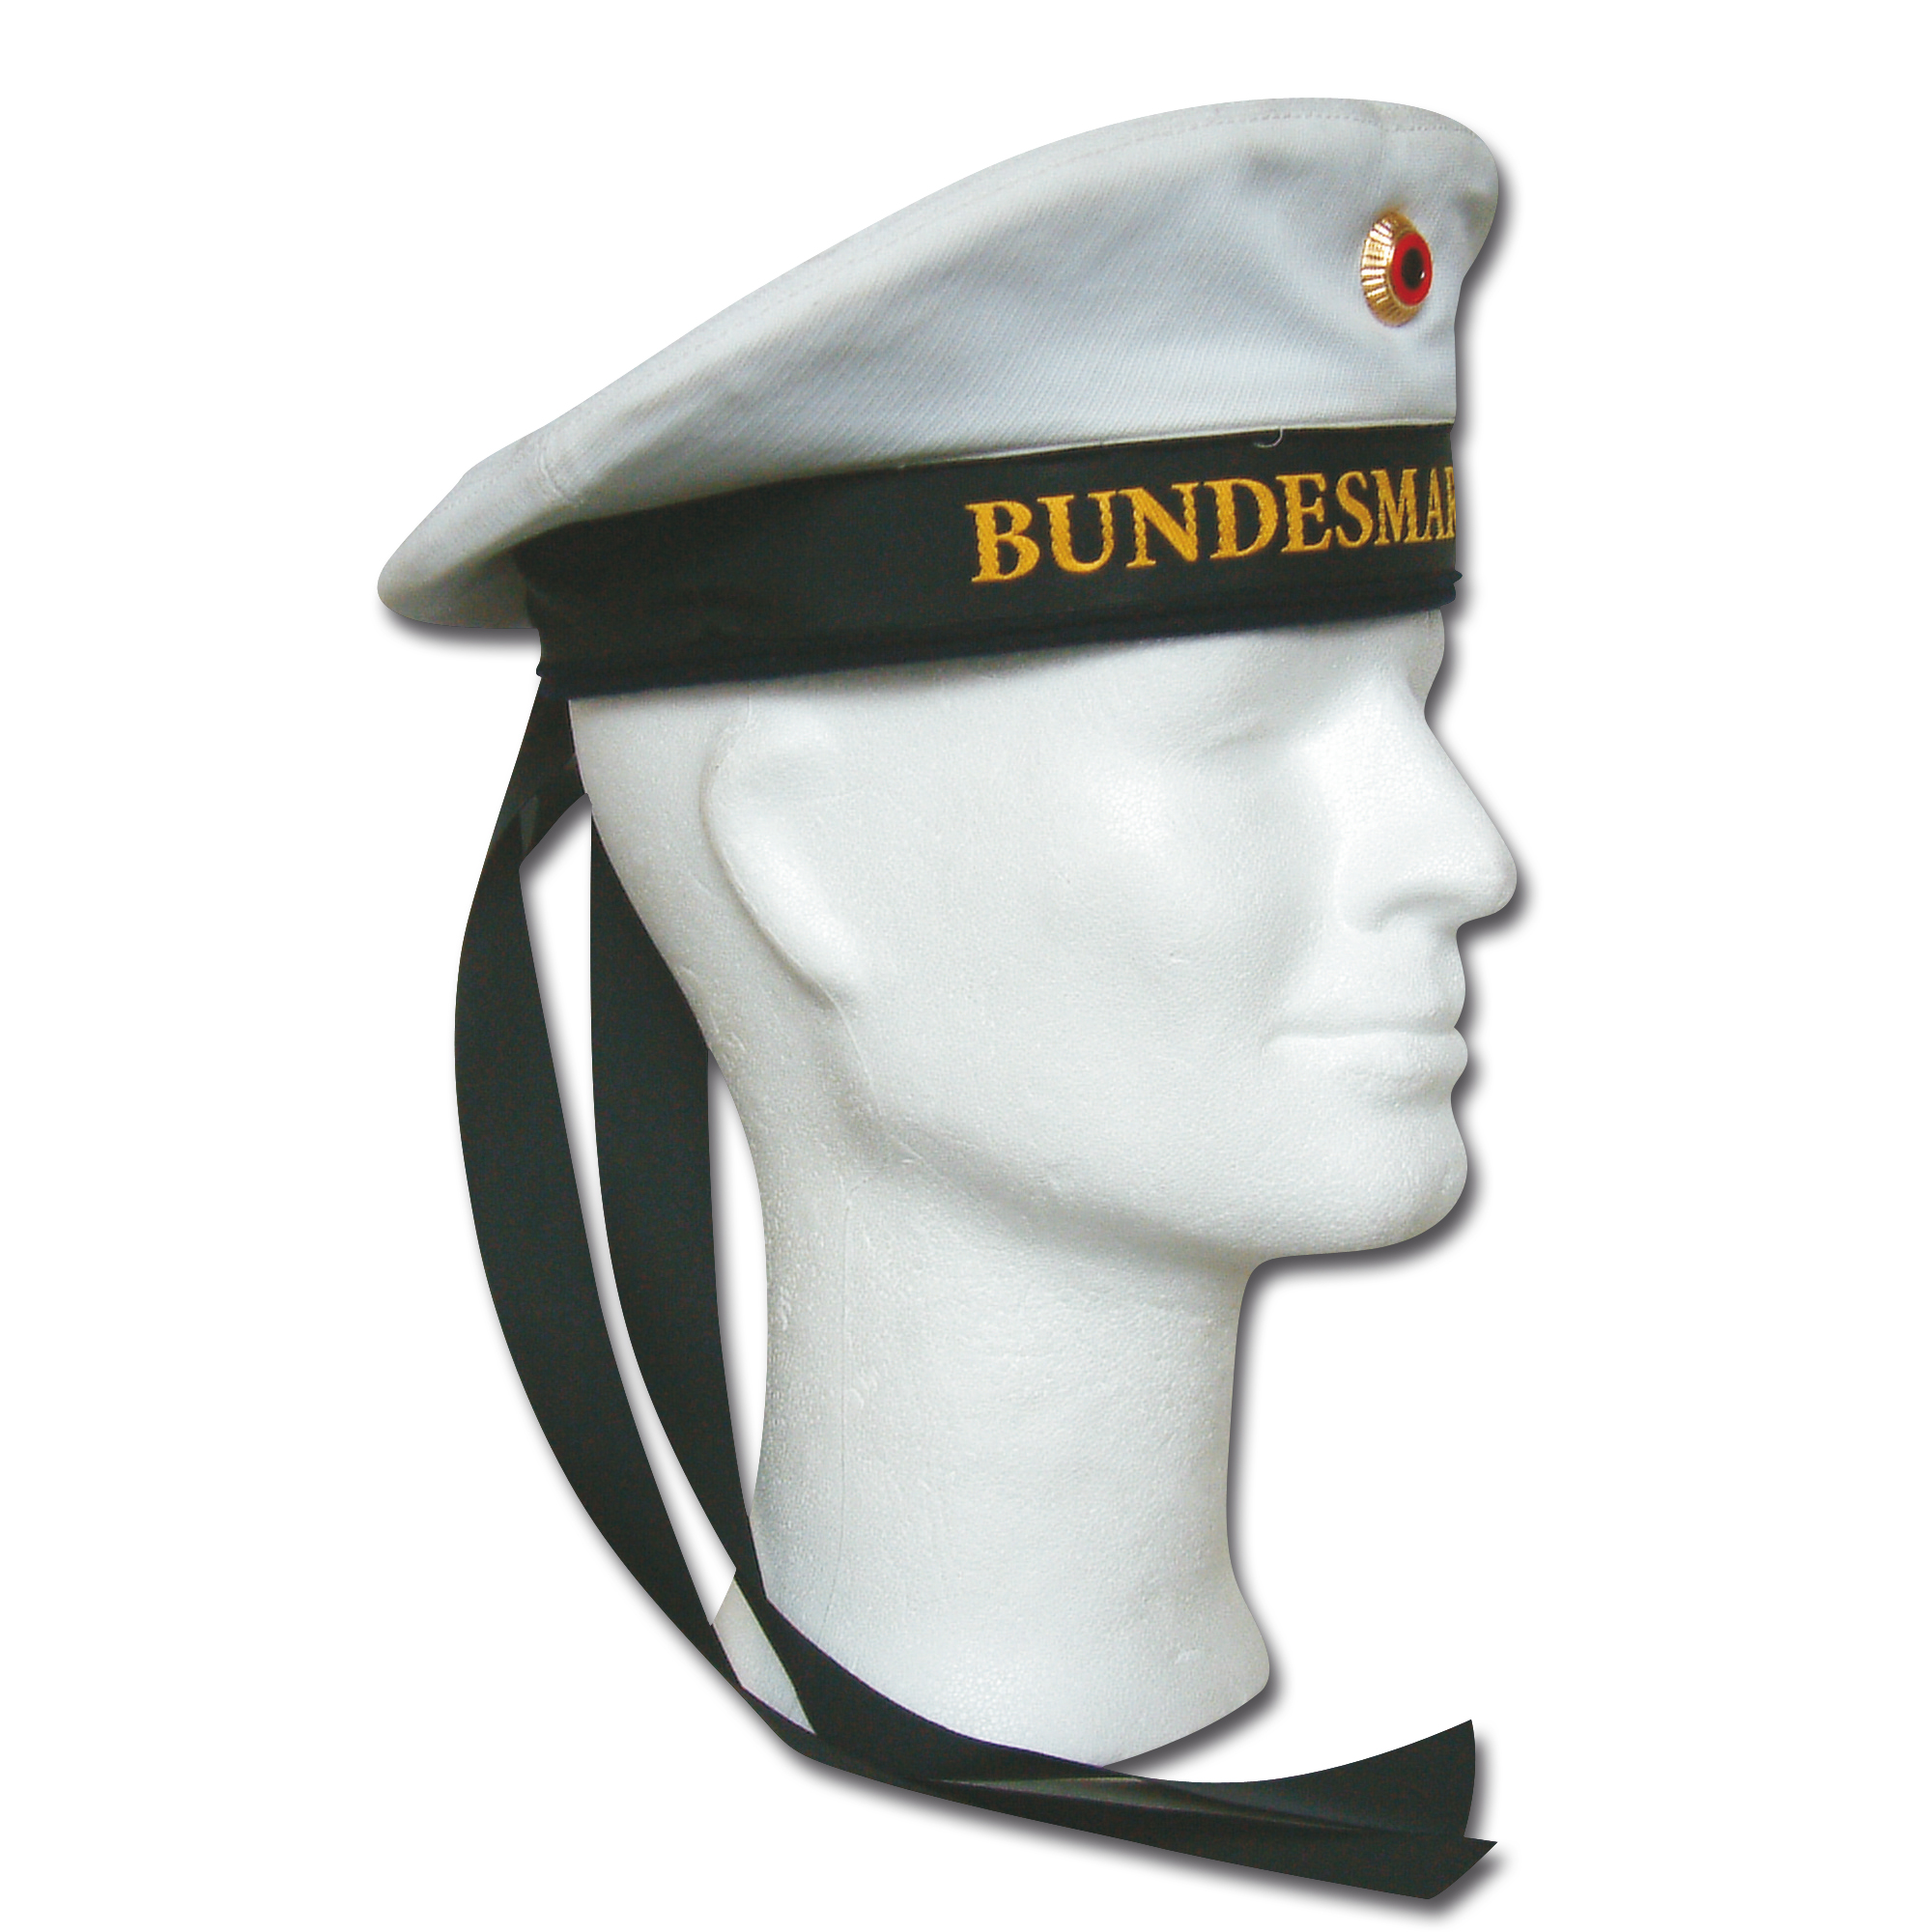 German Navy Sailor Cap Used